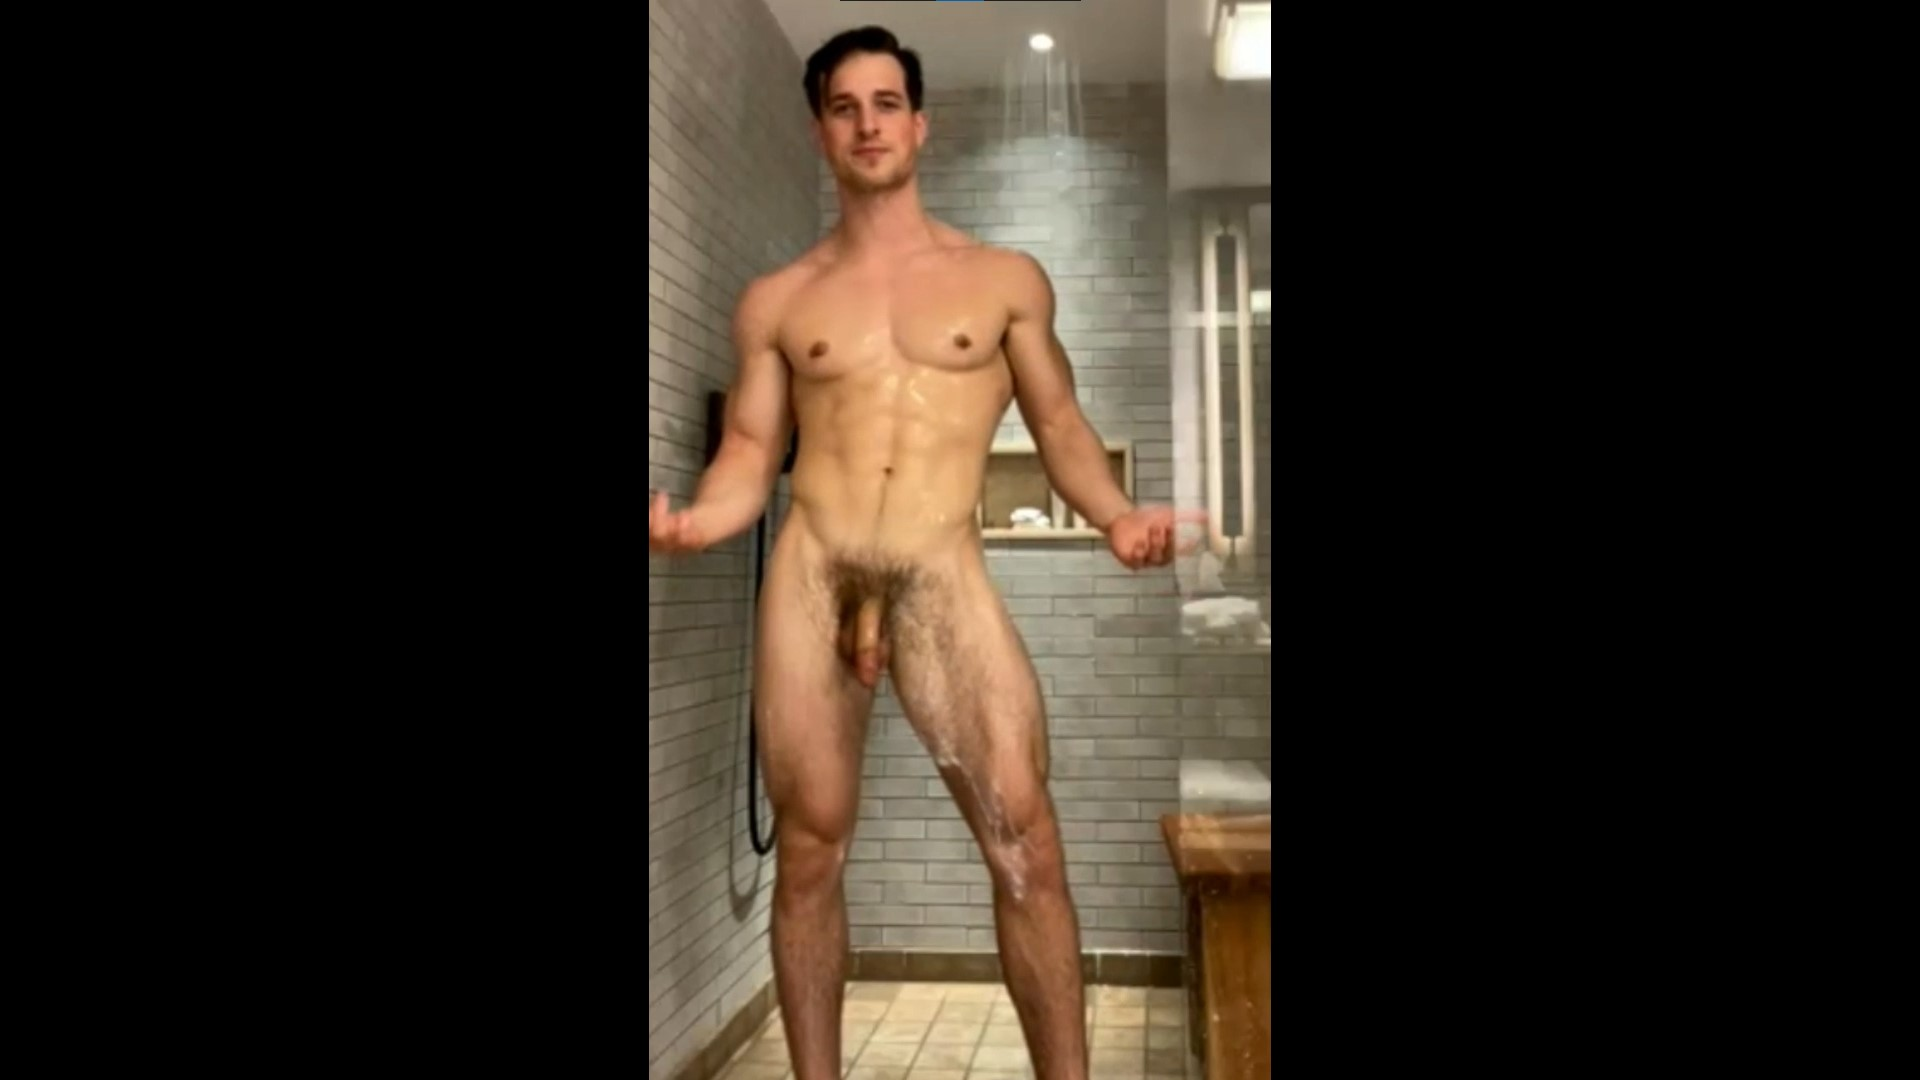 Having a quick shower - Nick Sandell